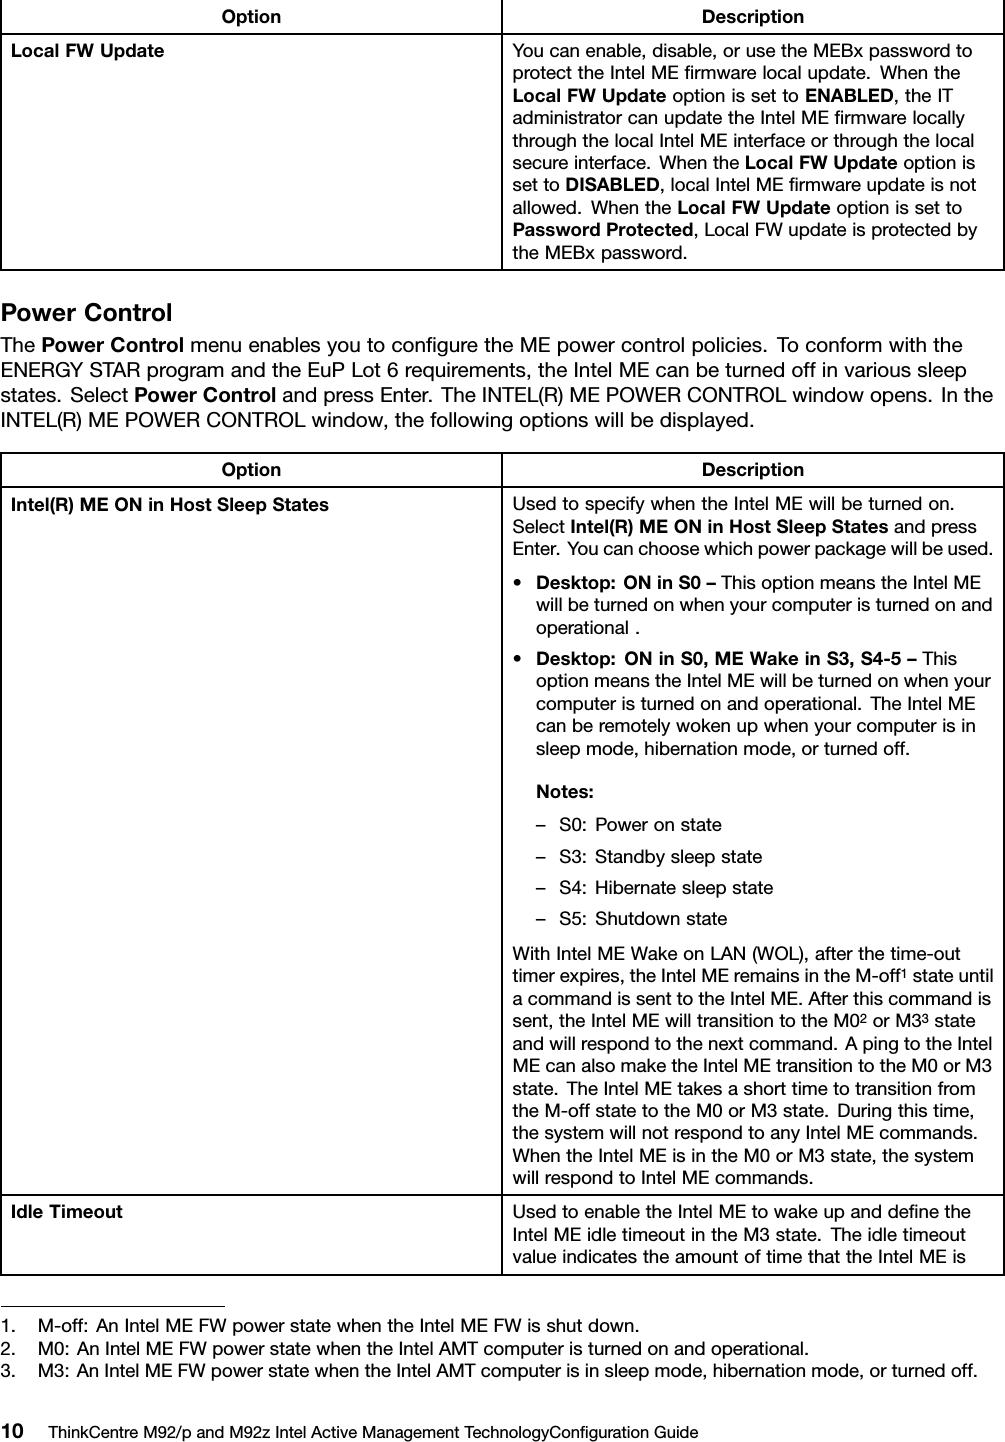 Lenovo M92P M92Z White Paper User Manual For Think Centre M92, M92p